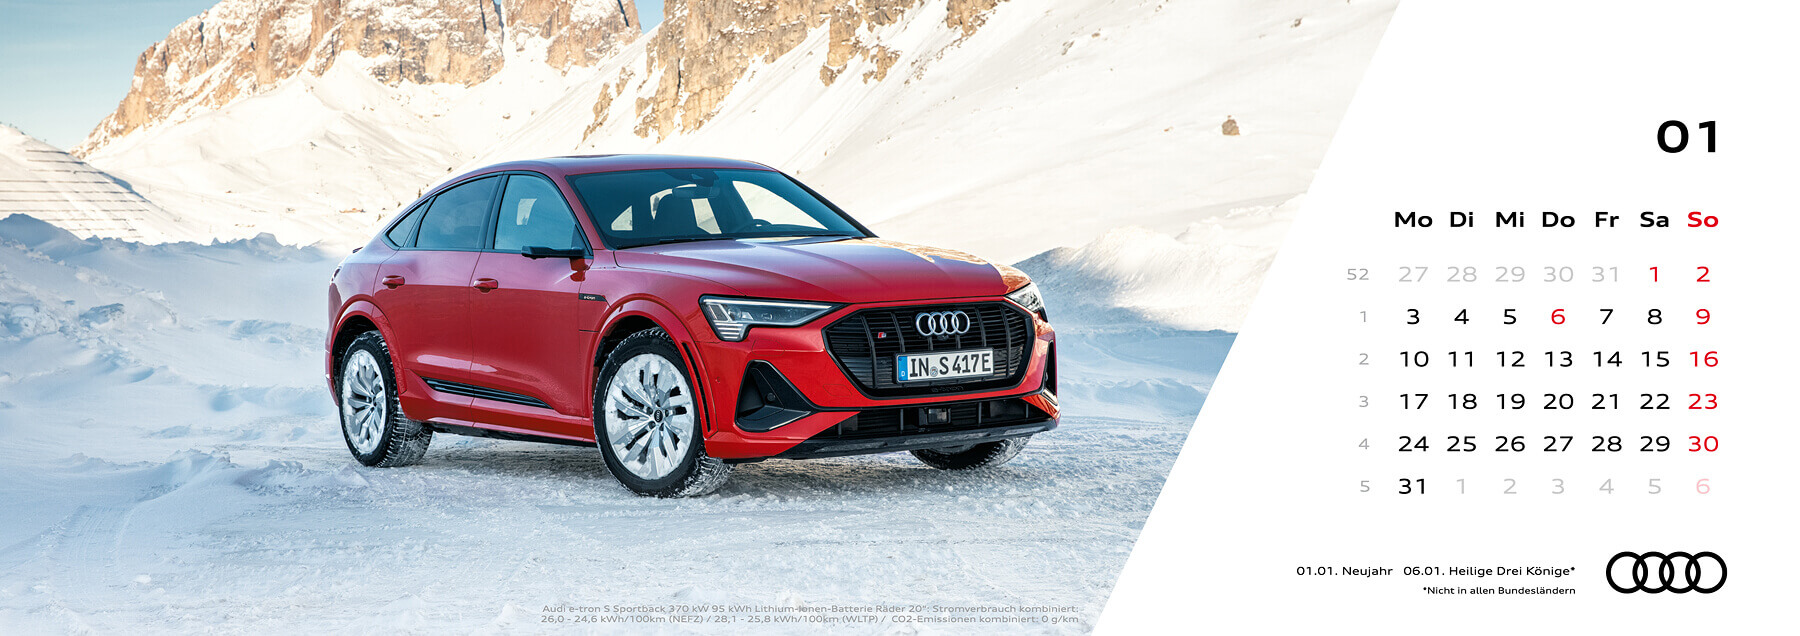 Audi Tischkalender 2022 - Januar